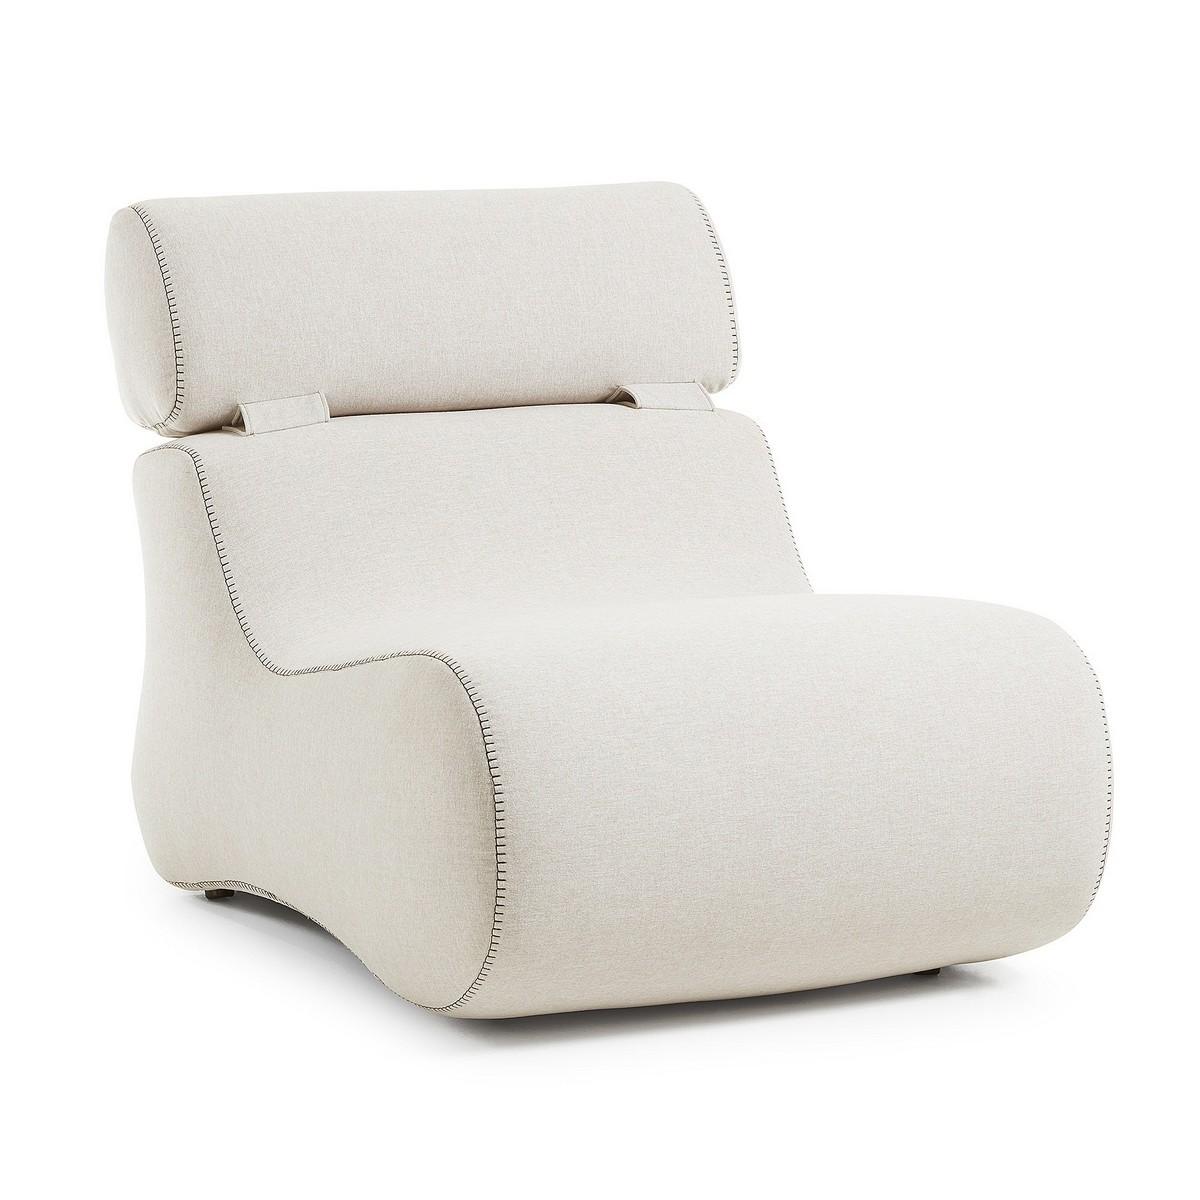 Novella Fabric Lounge Chair, Beige